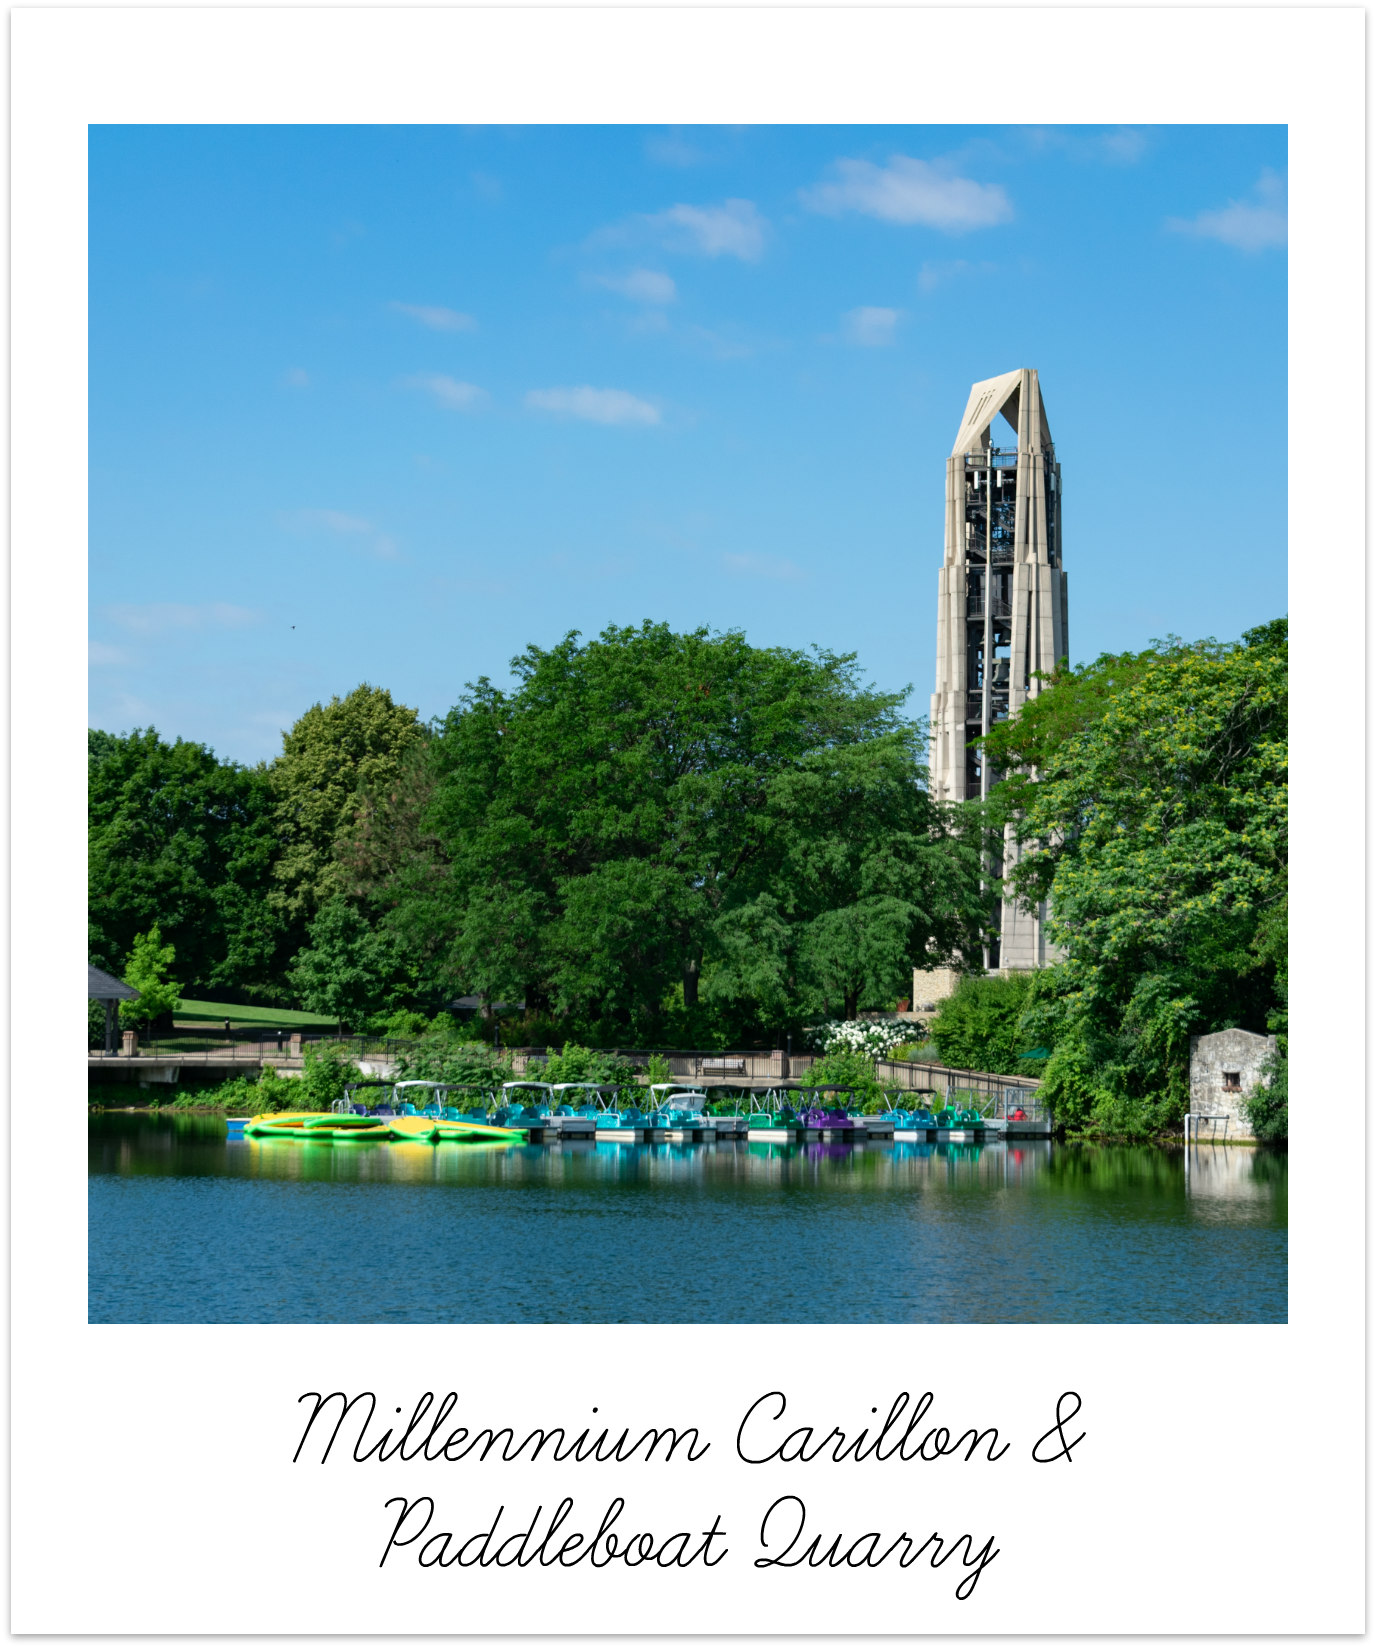 Naperville Millennium Carillon & Paddleboat Quarry BRIX Picks